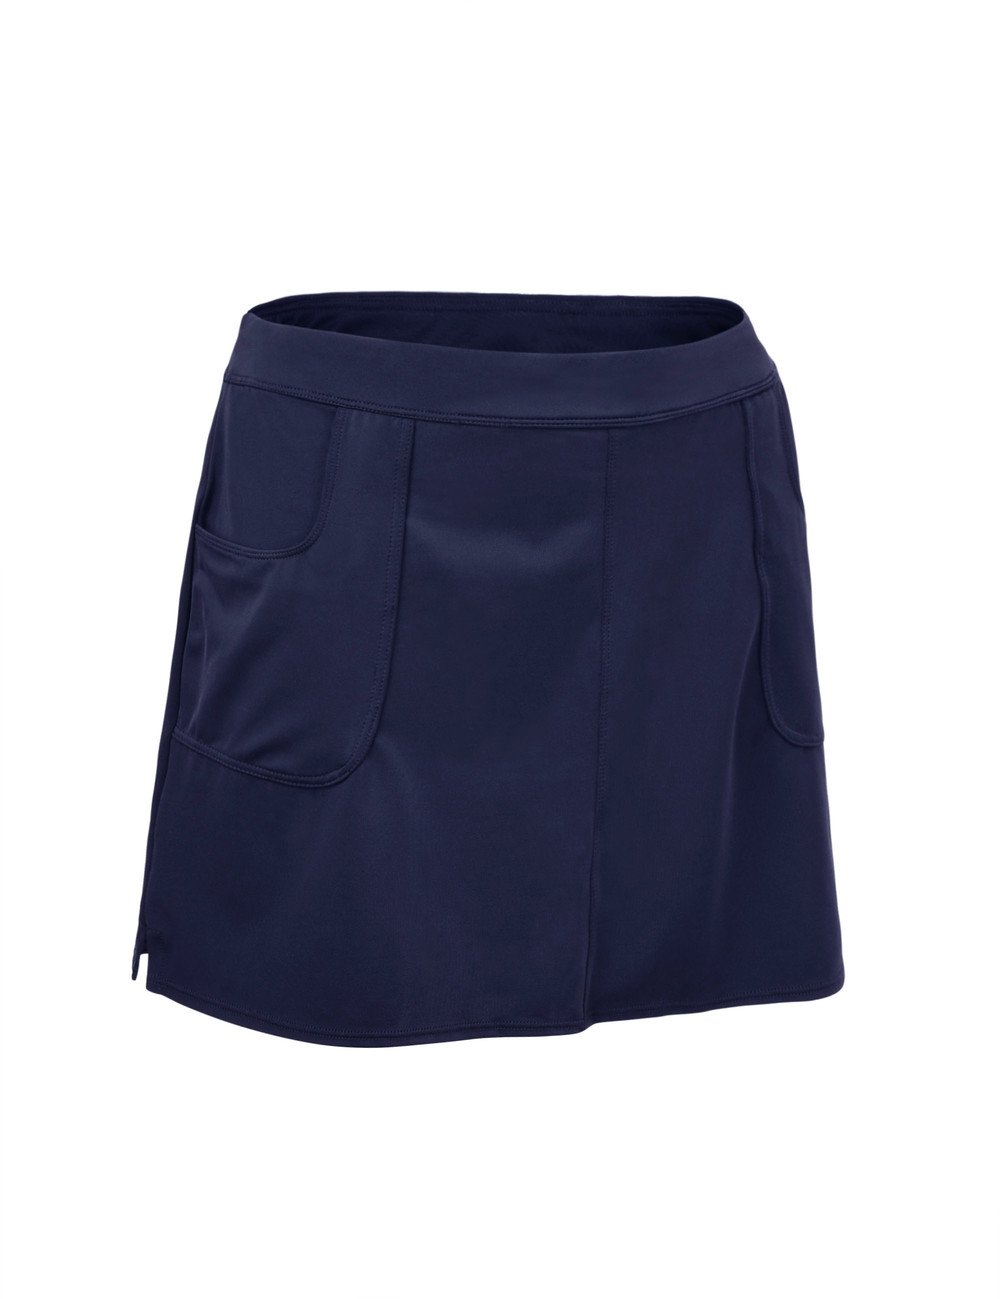 ninovino Womens Skirted Bikini Bottom High Waisted Solid Color Swim Skirt